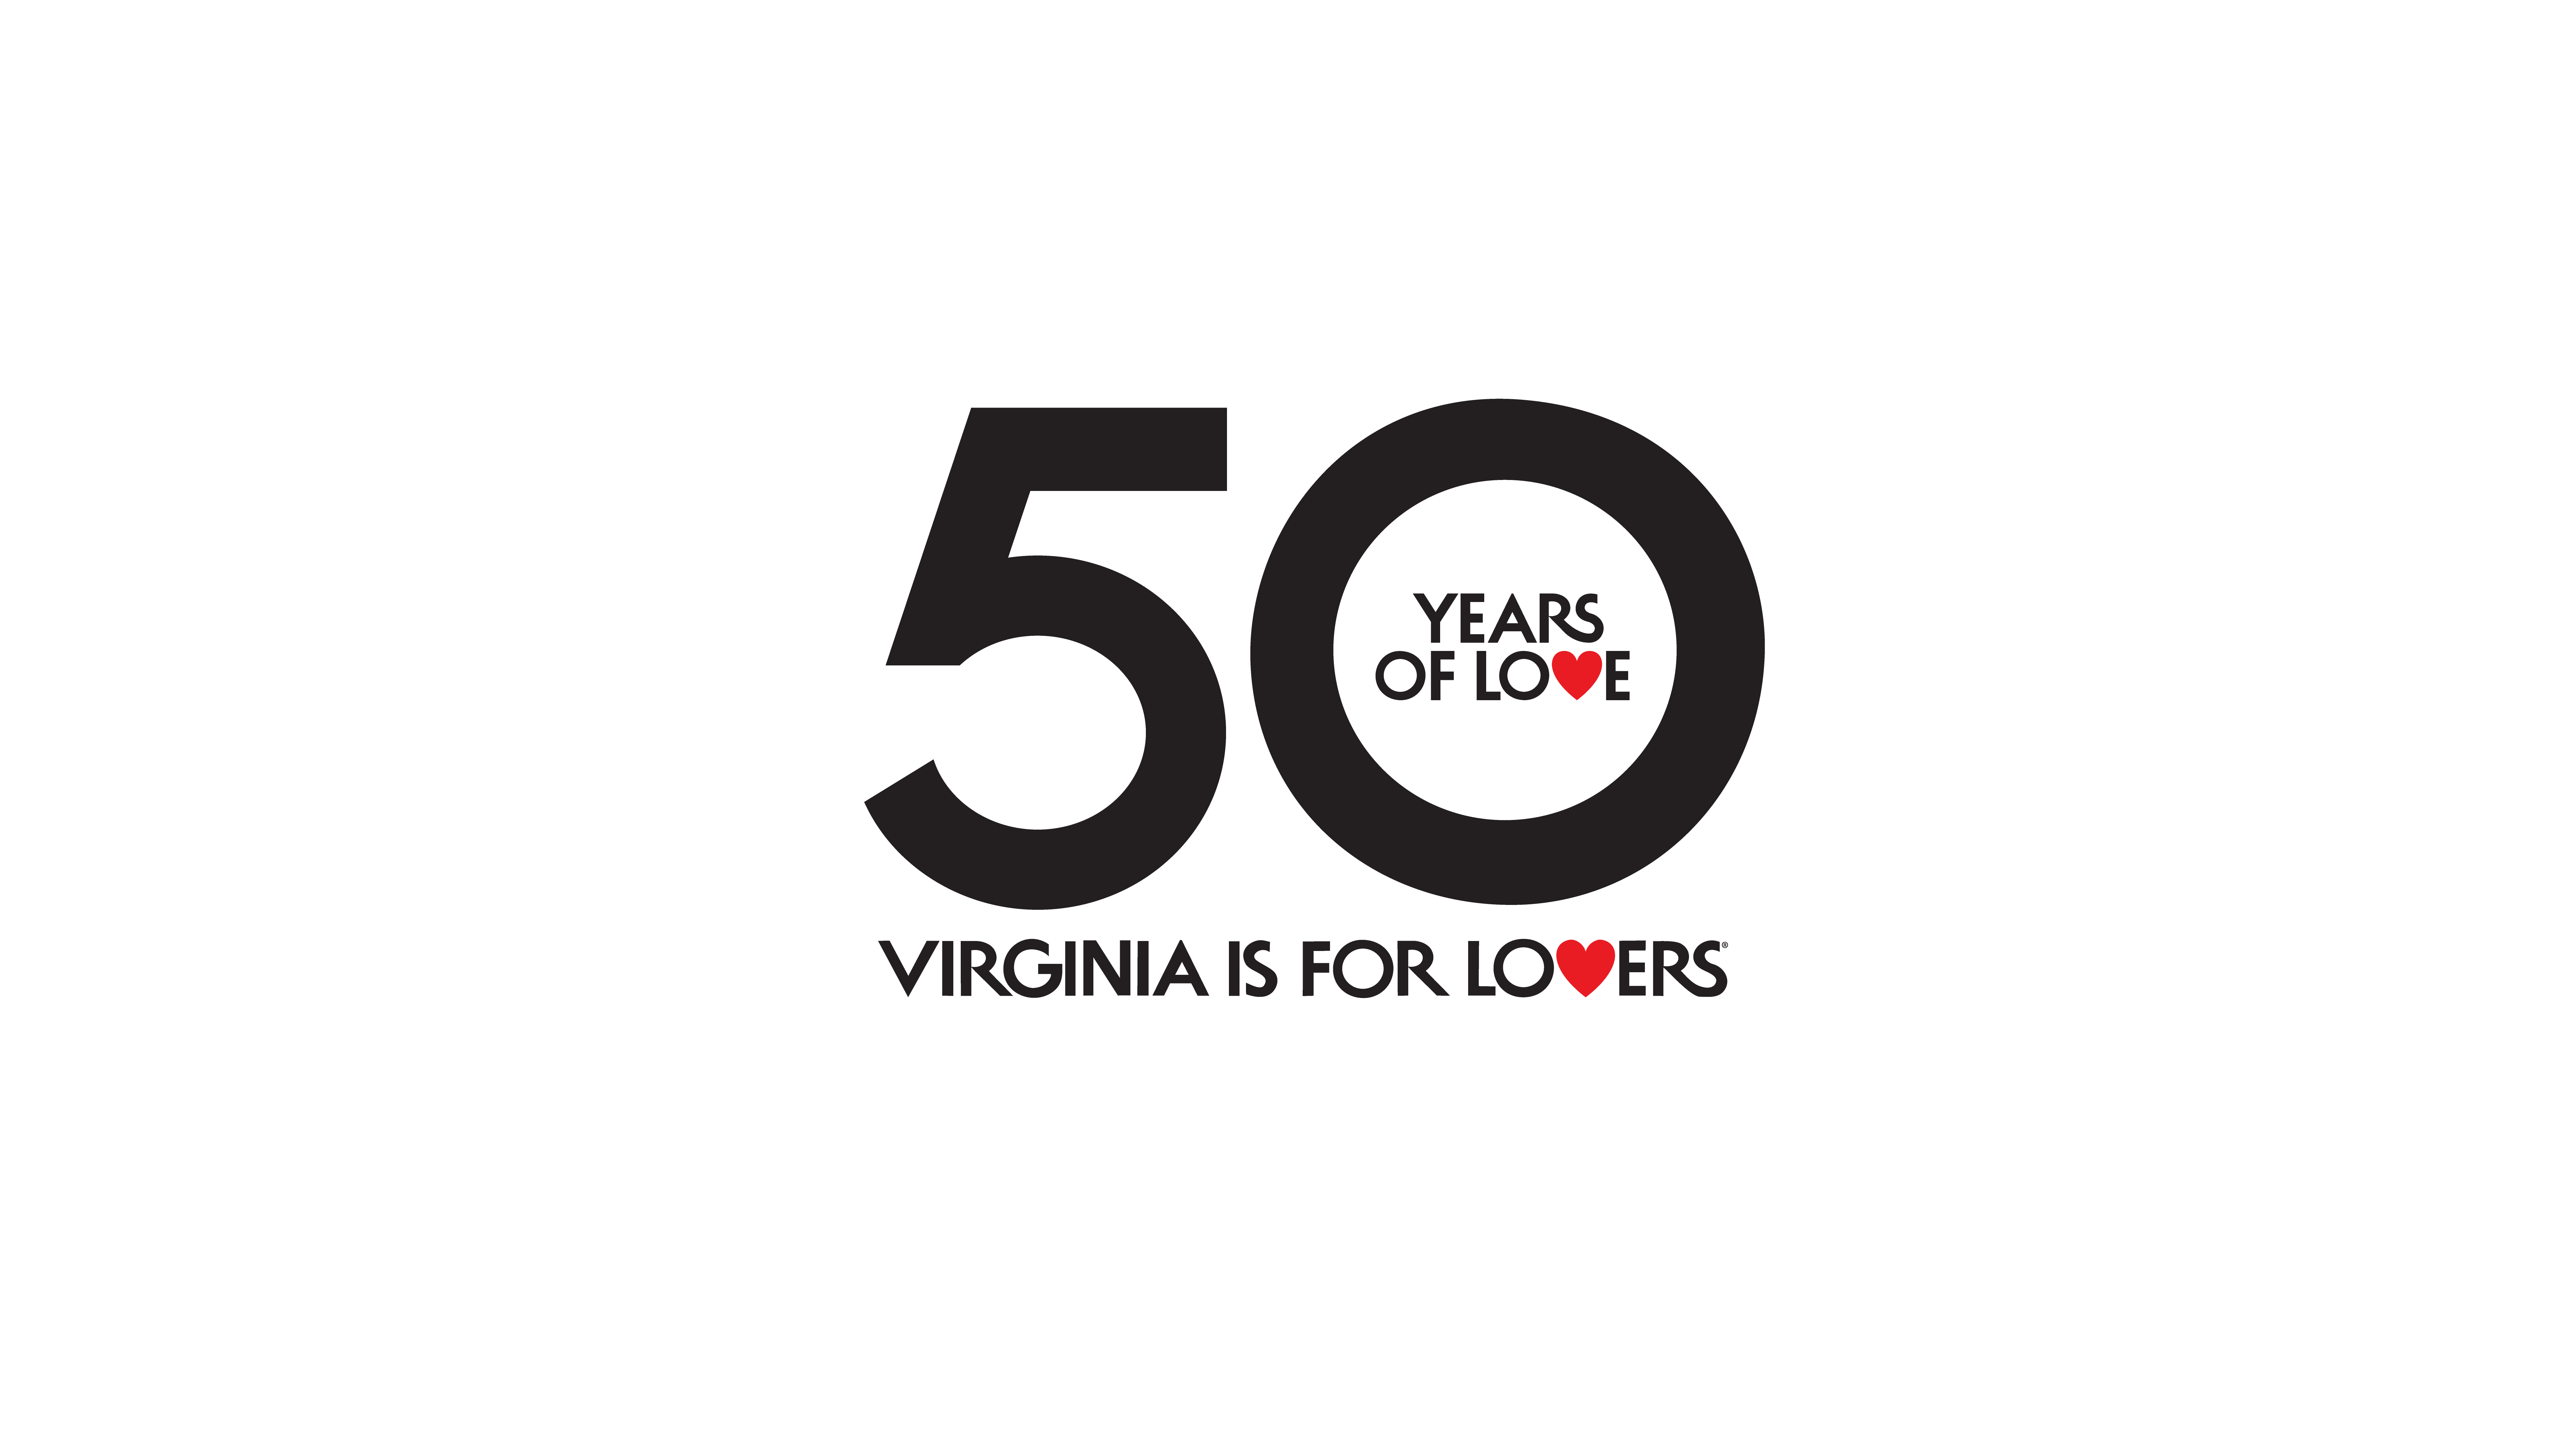 Virginia State lov om dating